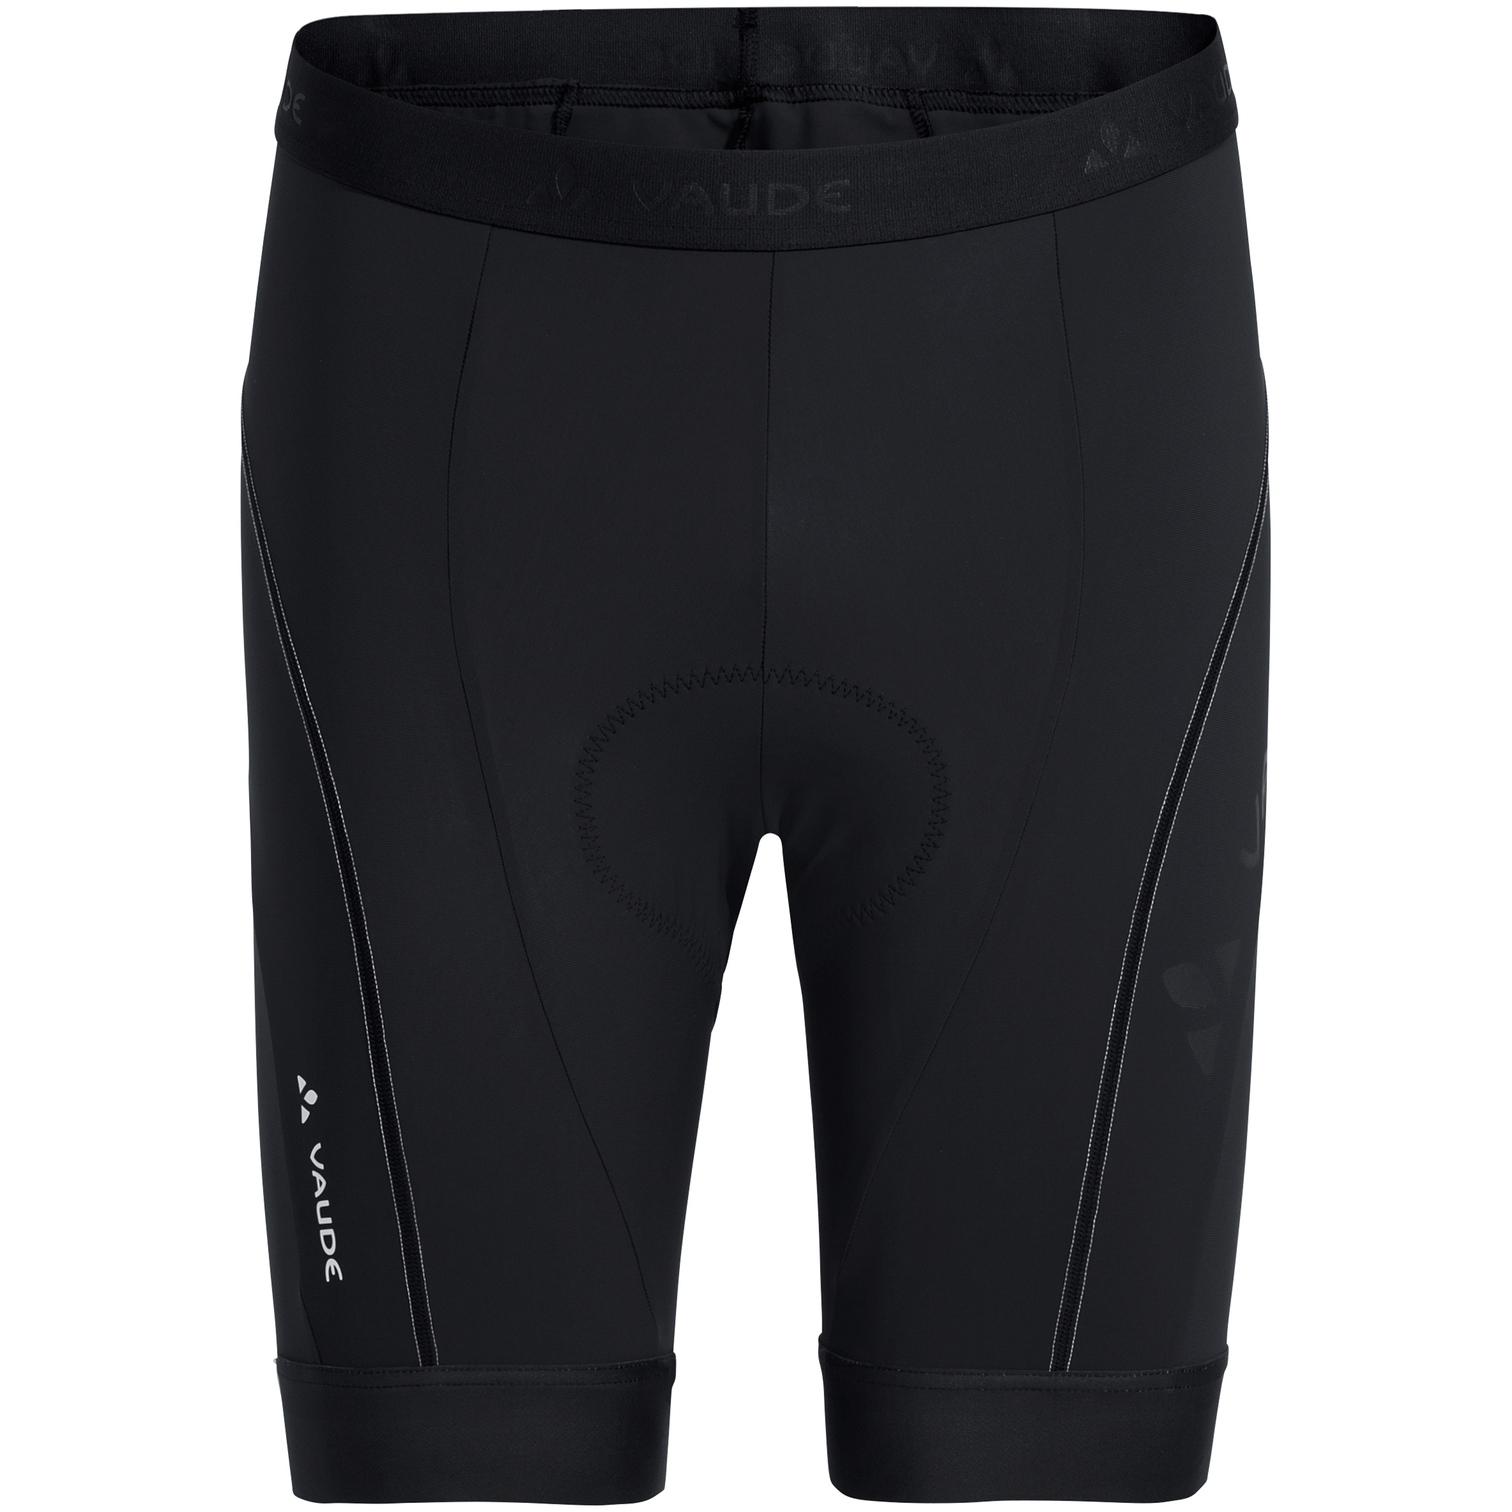 Vaude Men's Pro Shorts - black